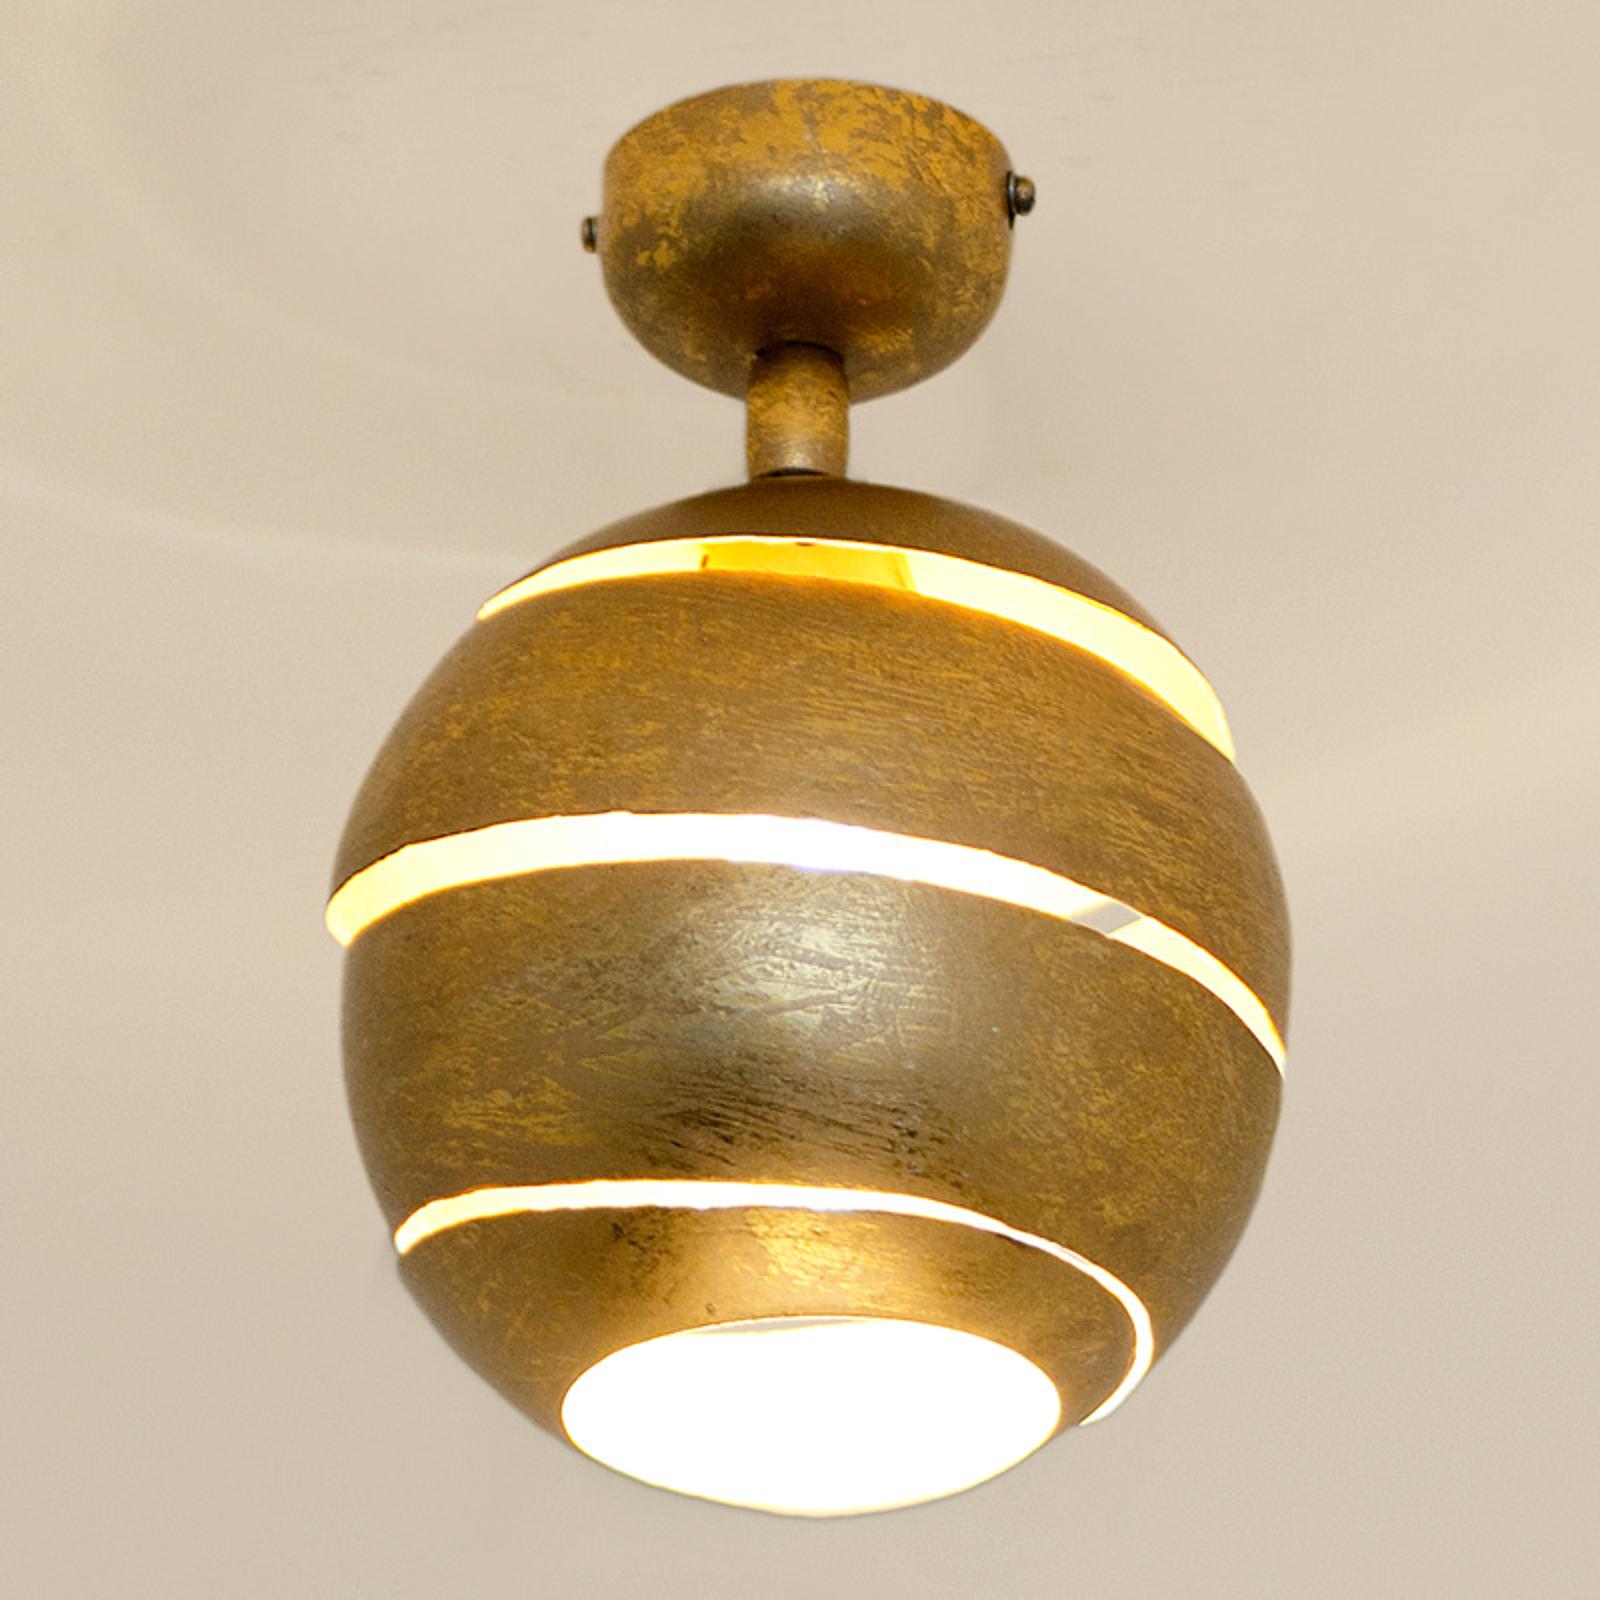 Zwenkbare plafondlamp Suopare in goud